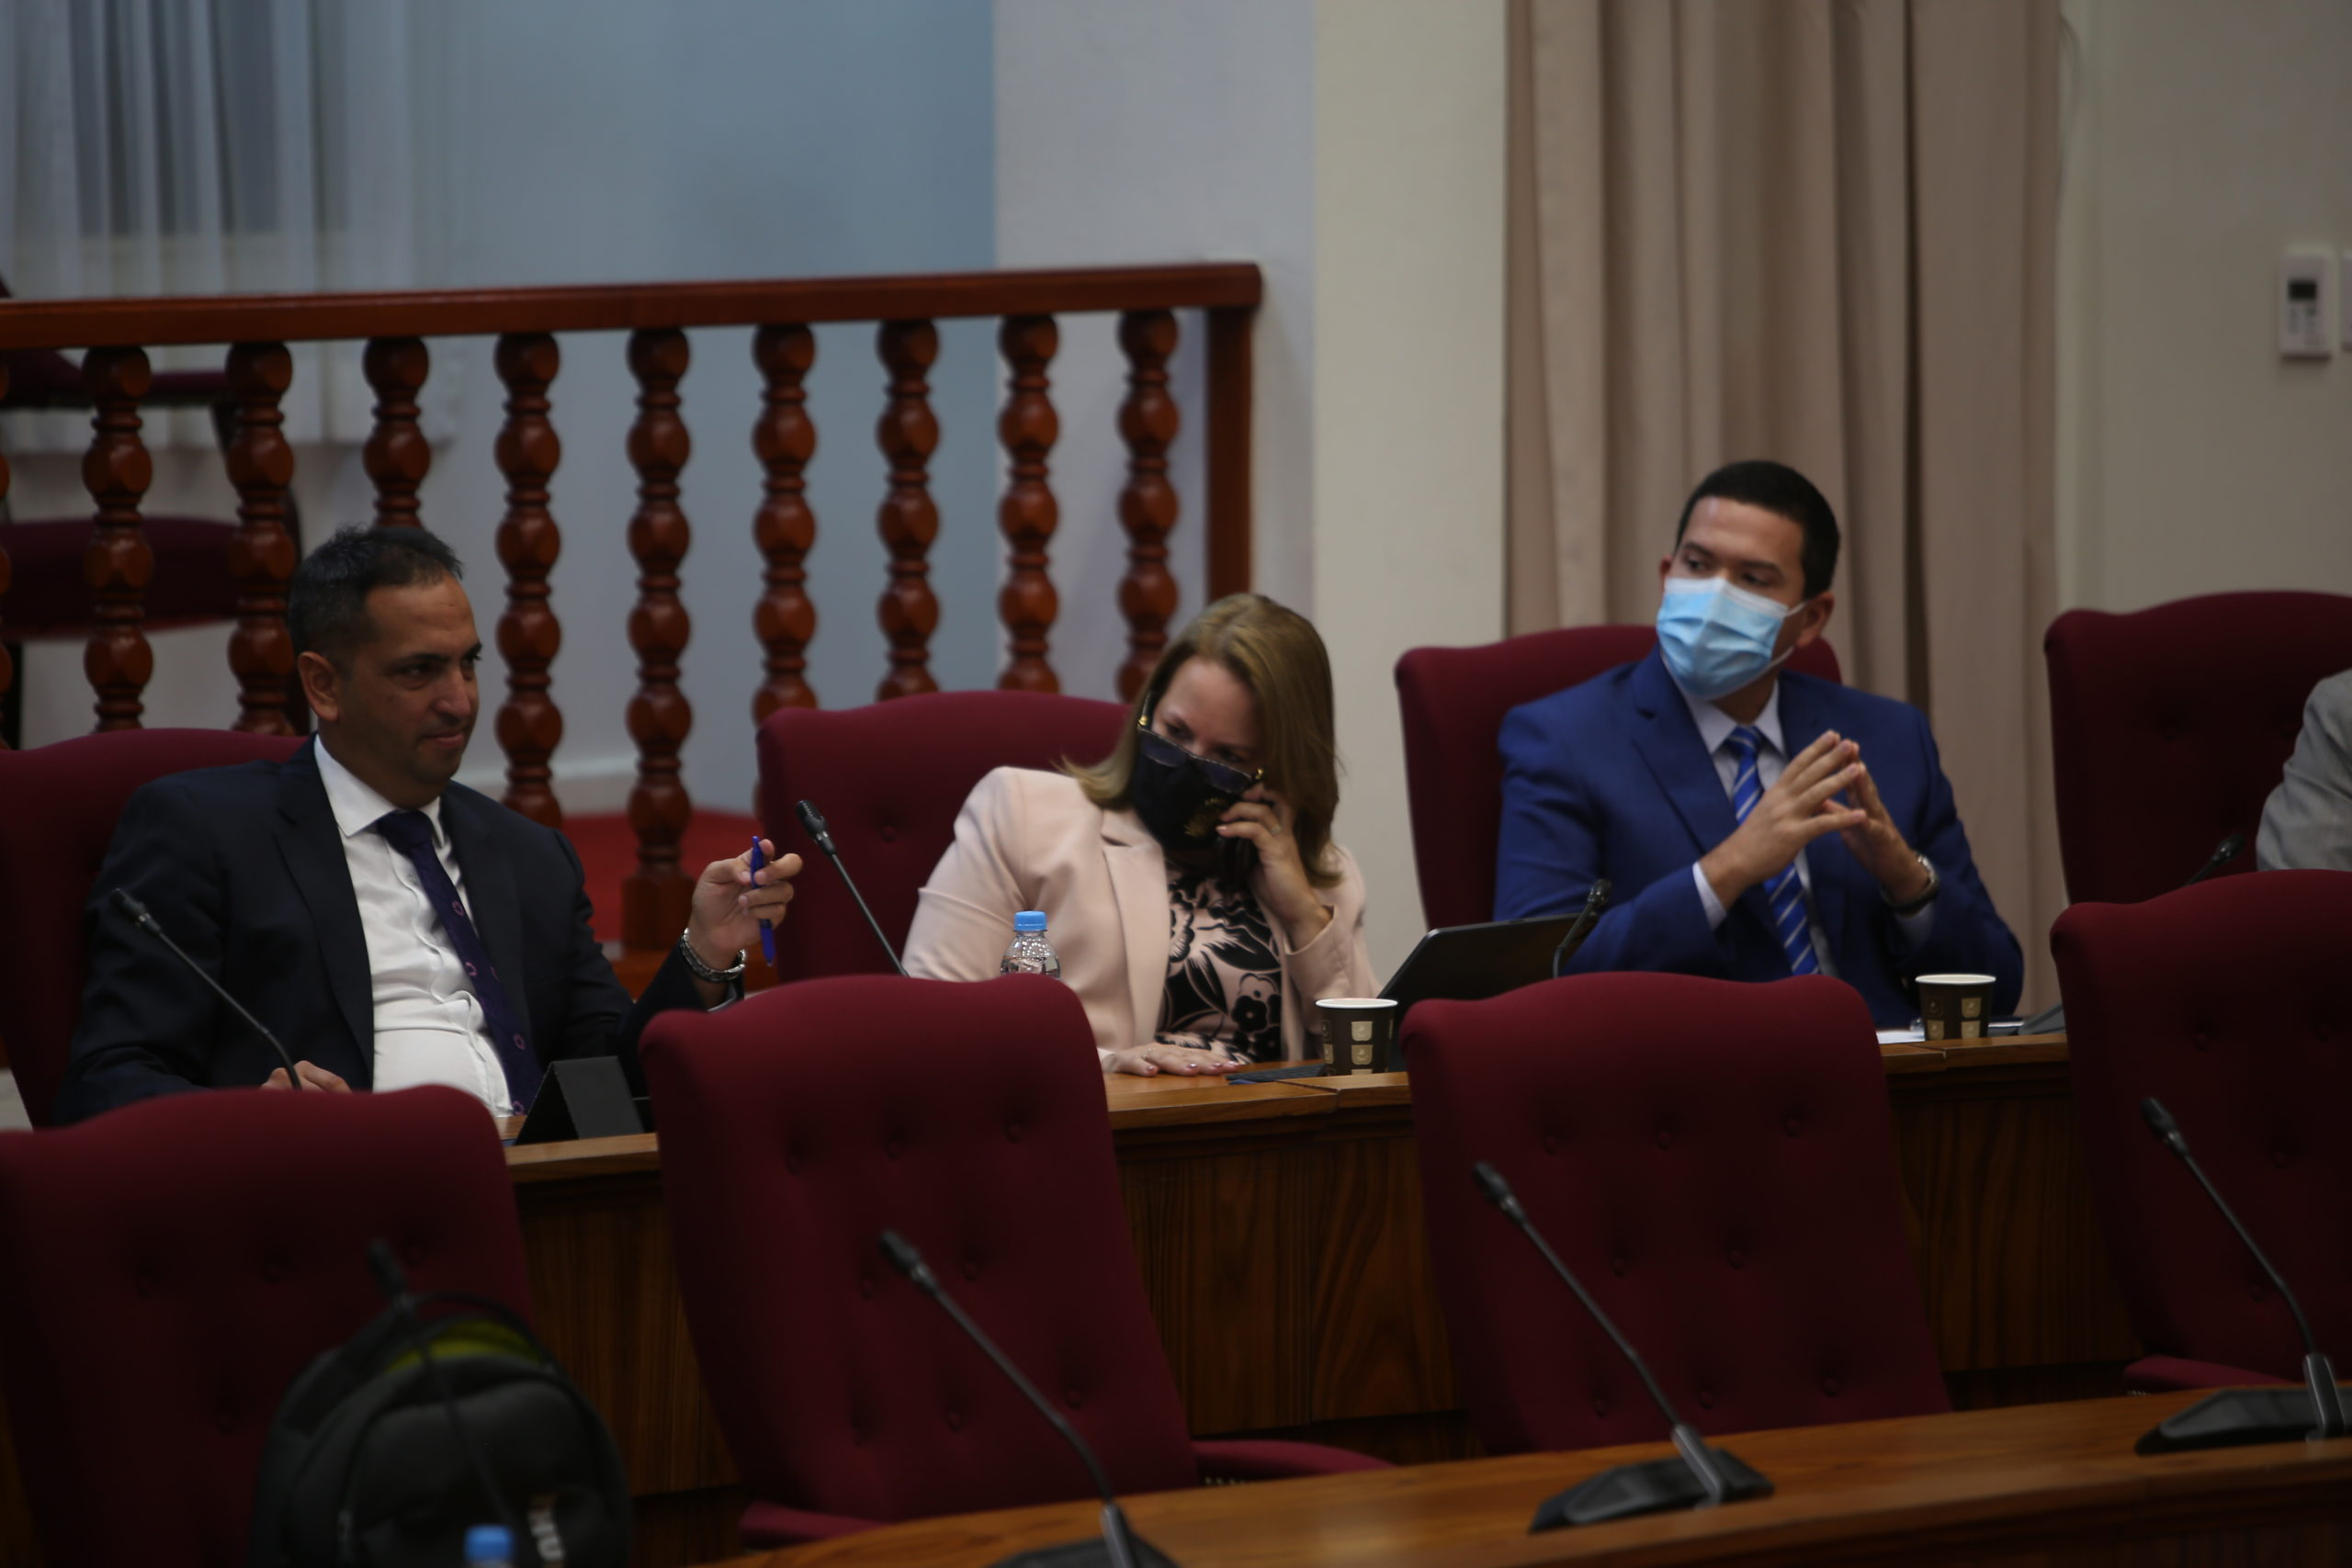 MEP: Tur parlamentario bou investigacion tin cu bandona nan funcion